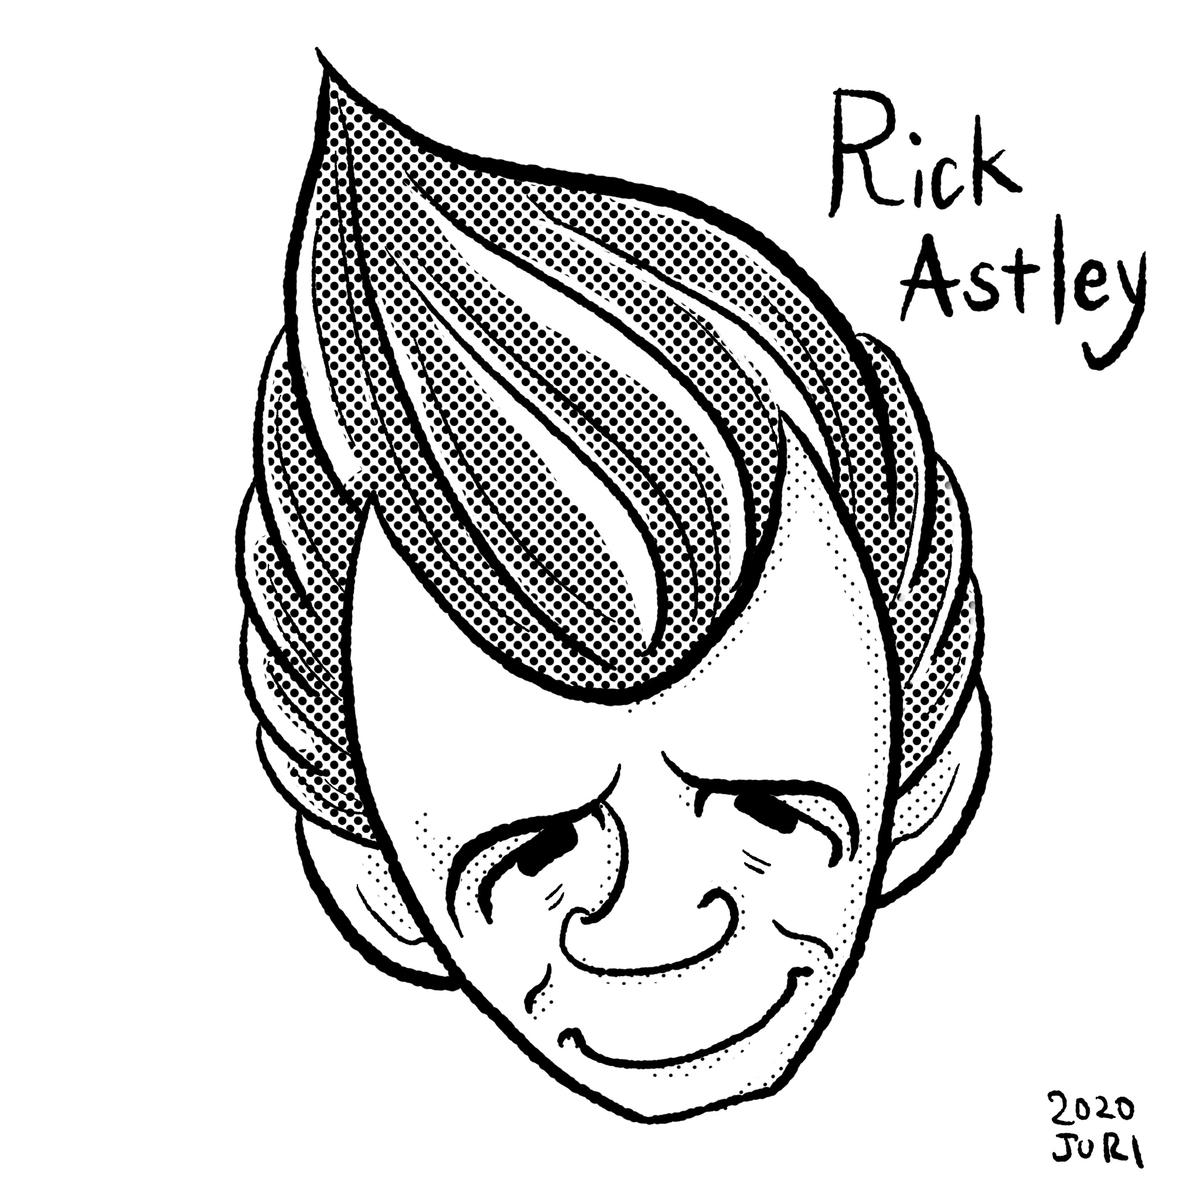 Rickastleyの似顔絵